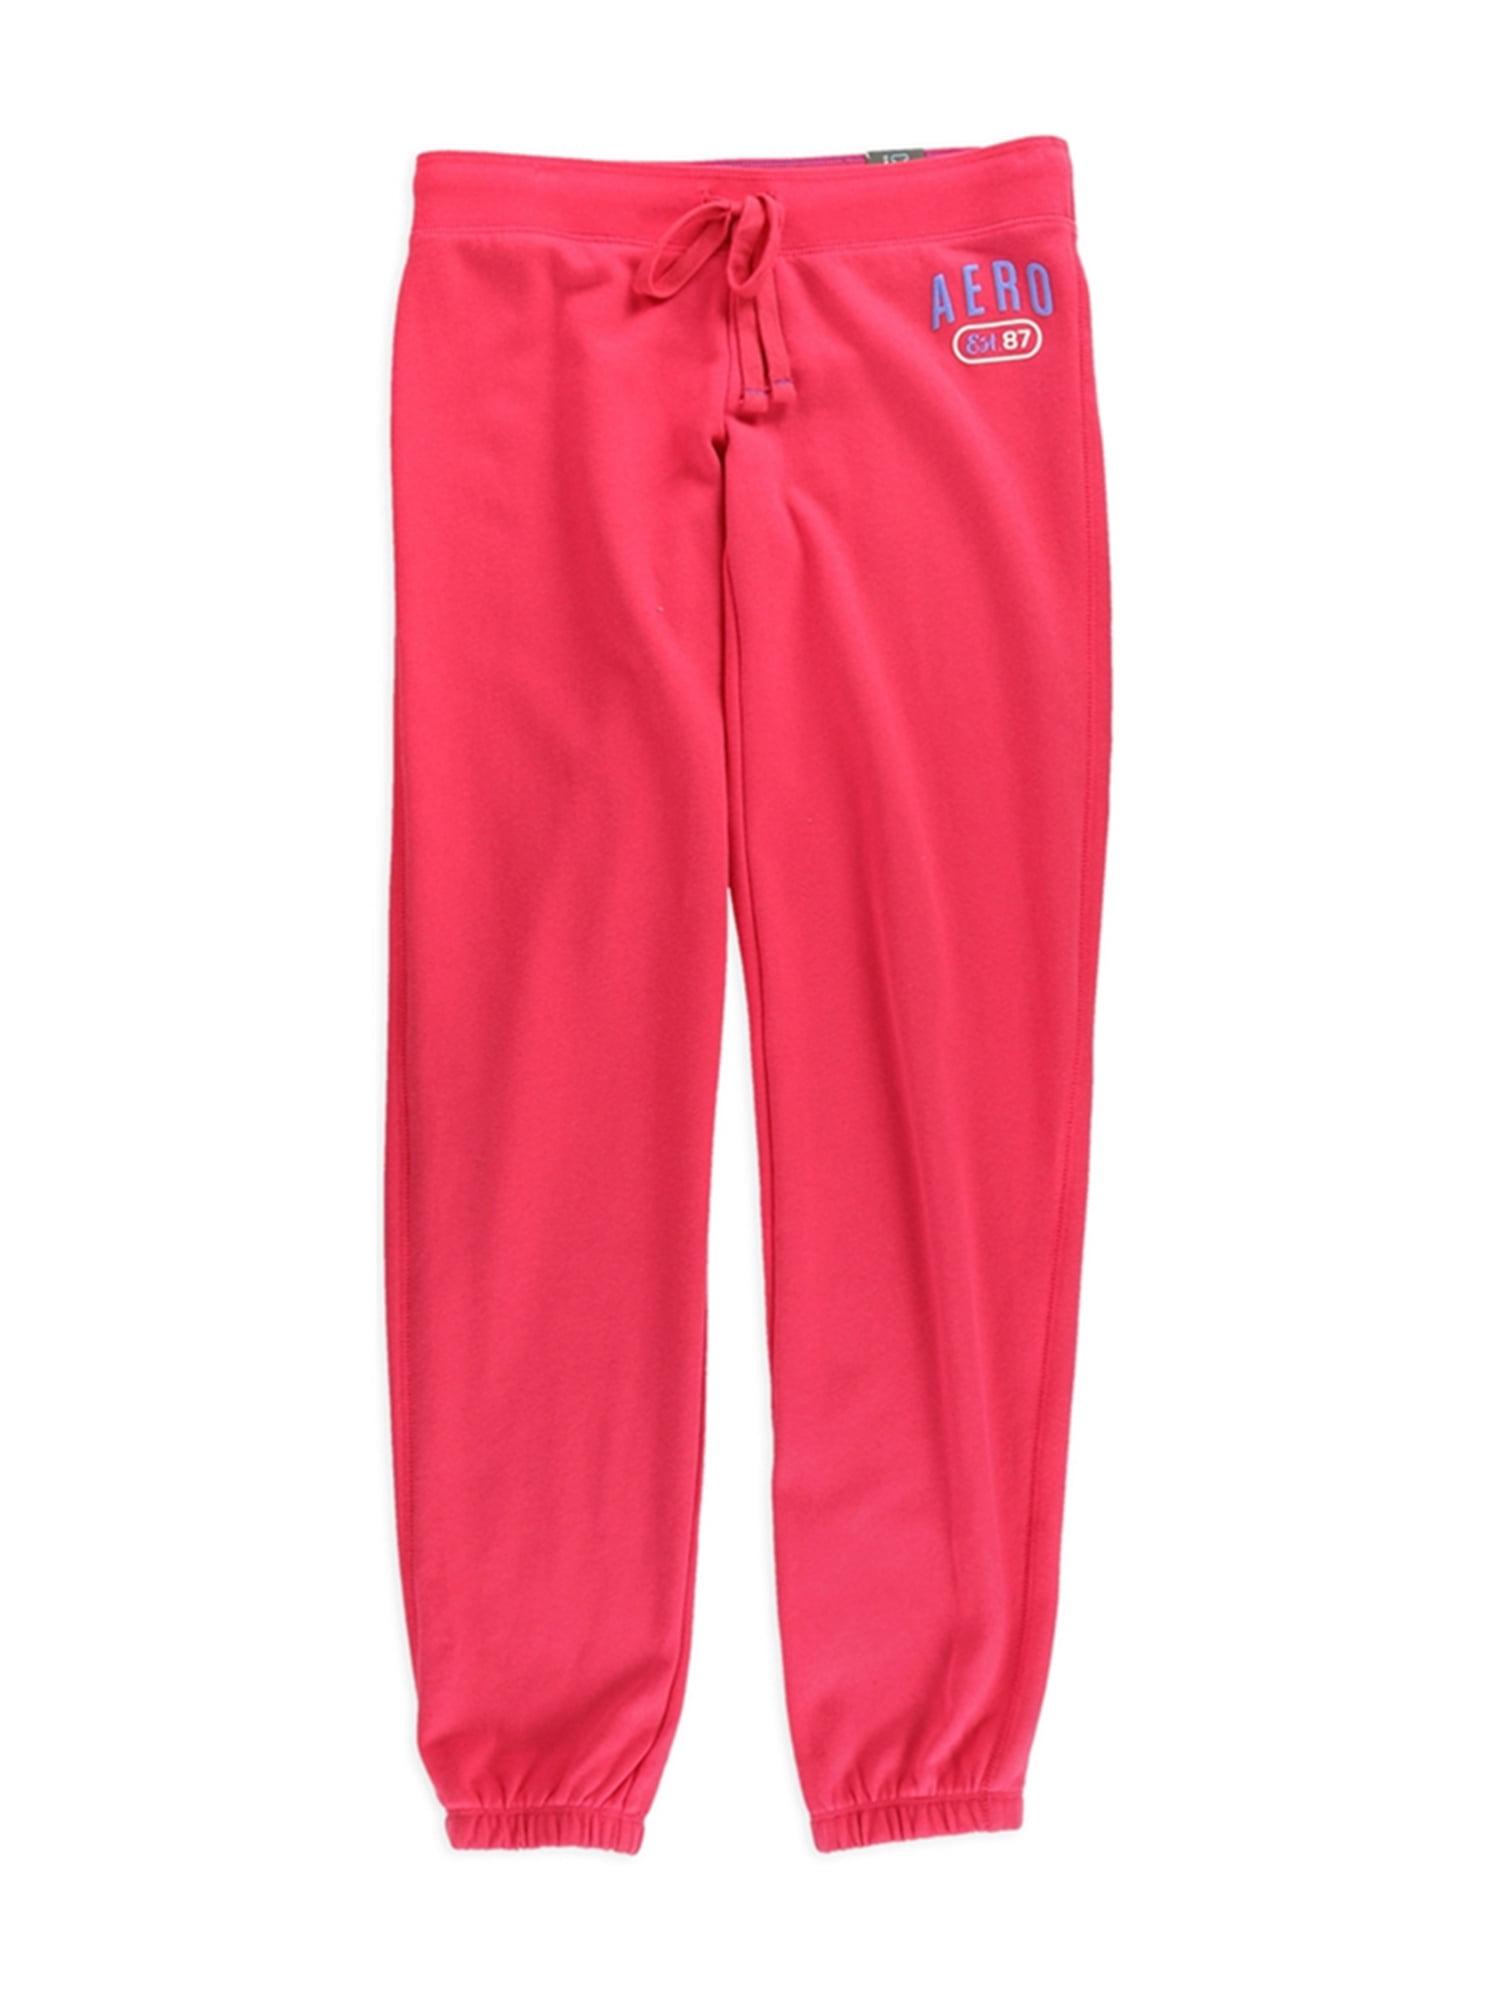 Aeropostale Womens Classic Cinch Slim Casual Sweatpants